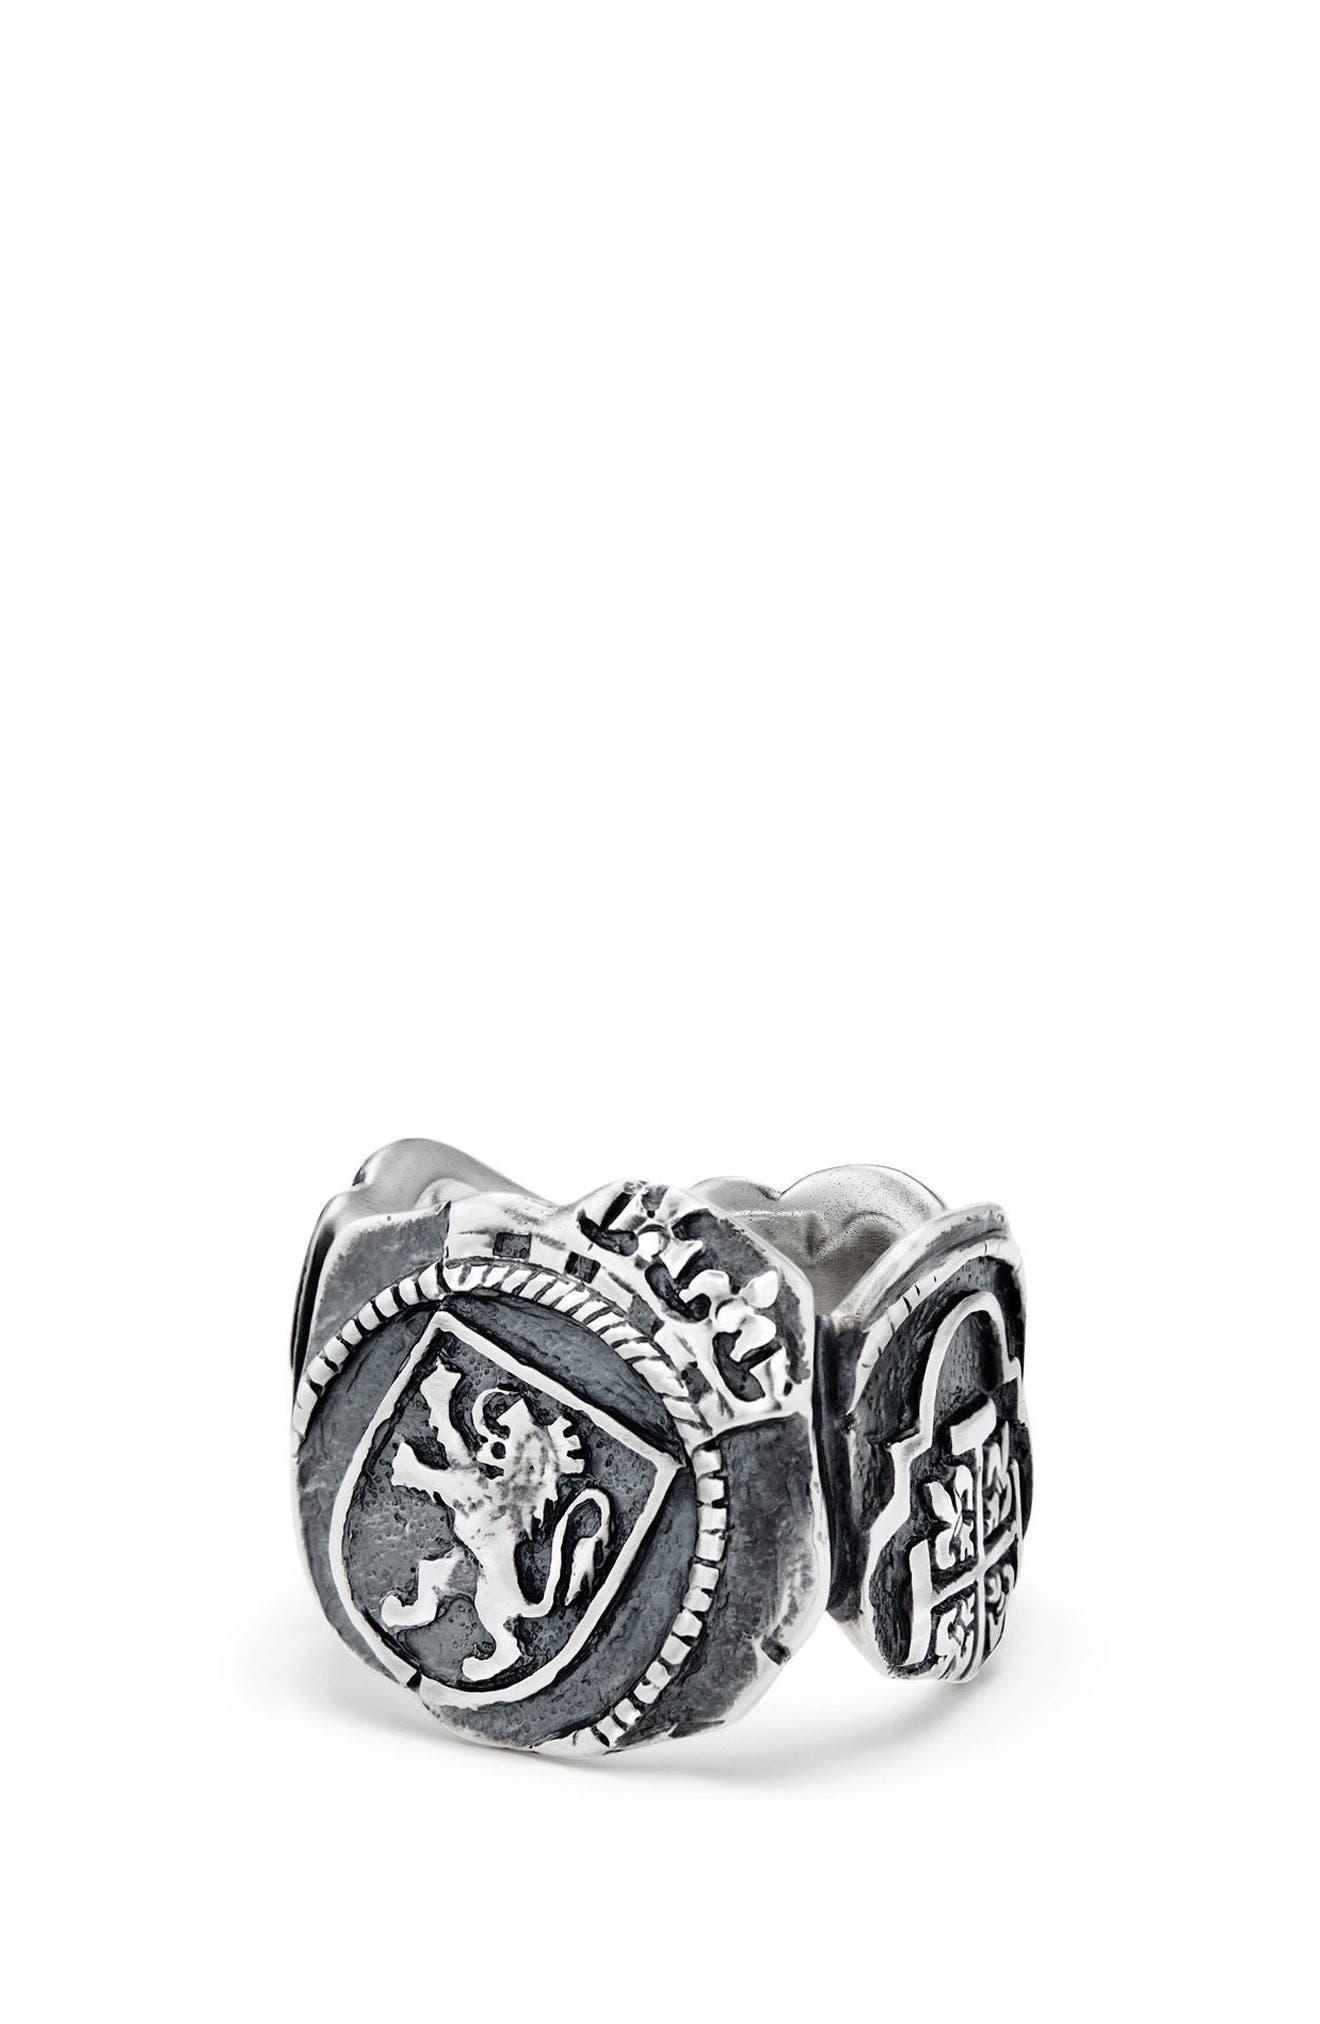 Main Image - David Yurman Shipwreck Signet Coin Ring, 20mm